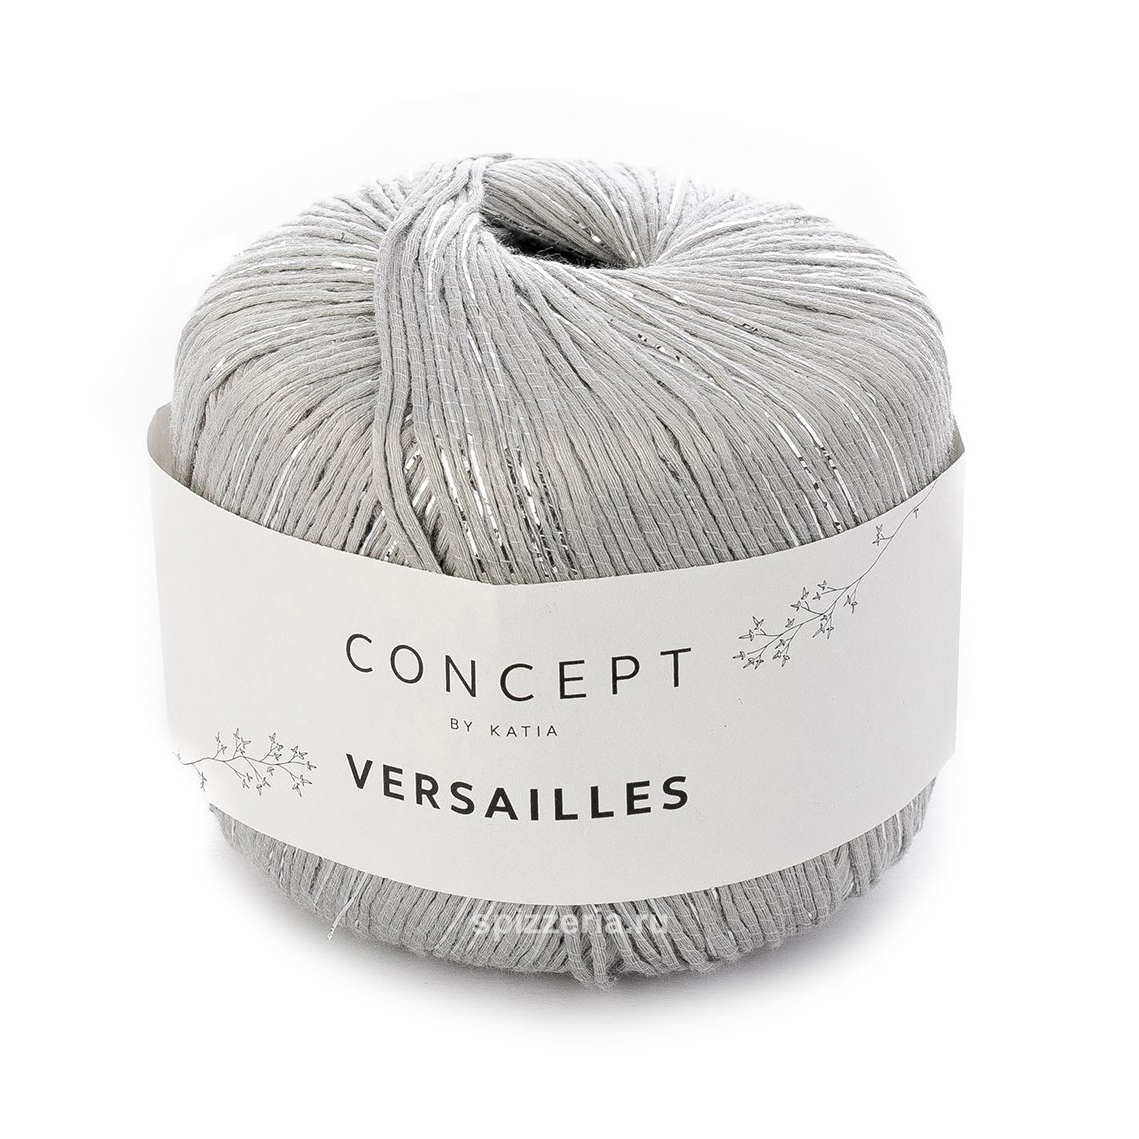 Versailles Concept by Katia